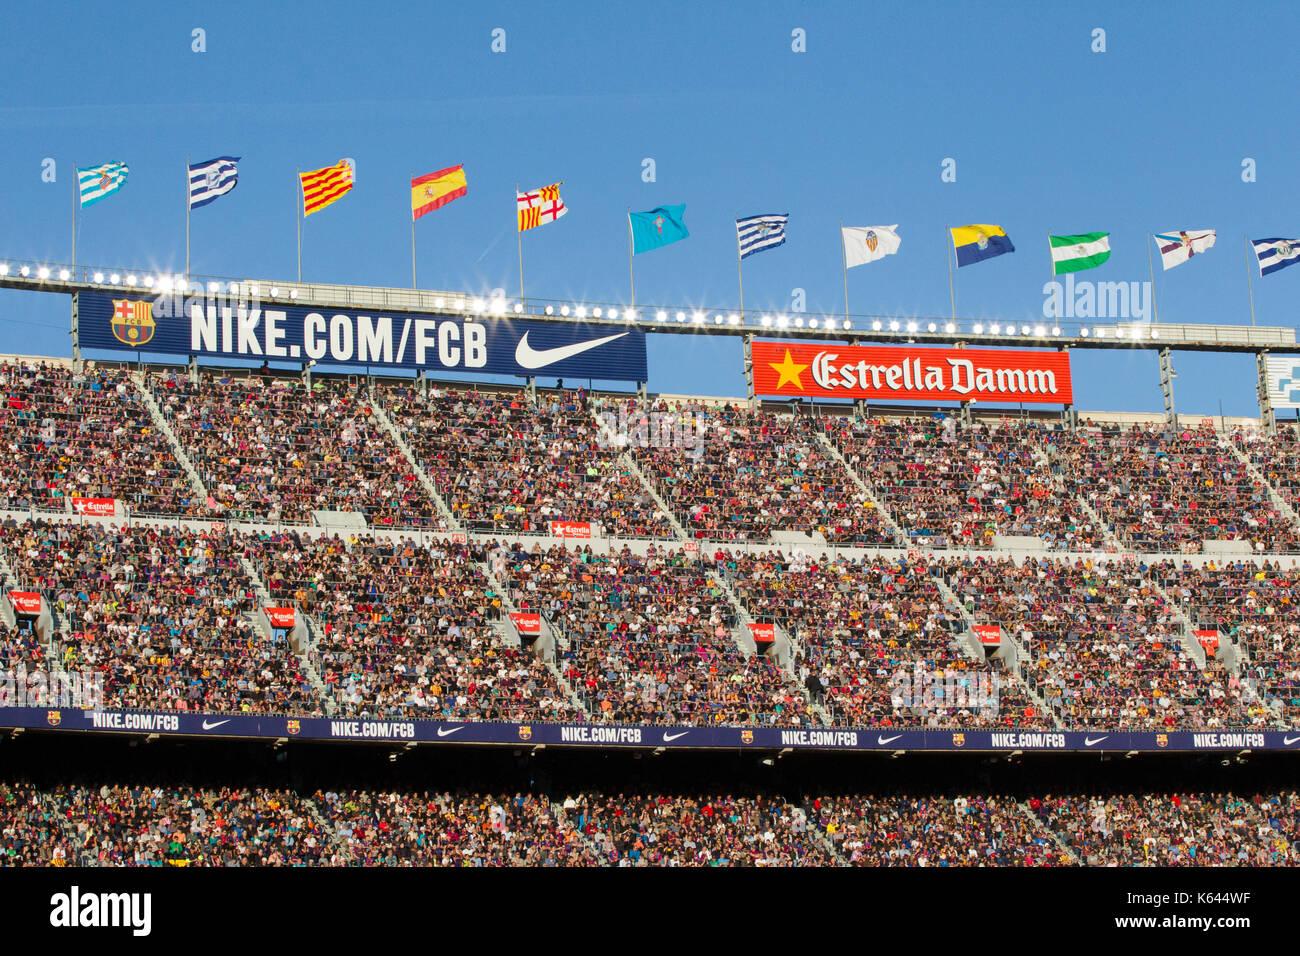 Fans at the Camp Nou stadium, Barcelona - 6/5/17 Barcelona v Villarreal football league match. - Stock Image